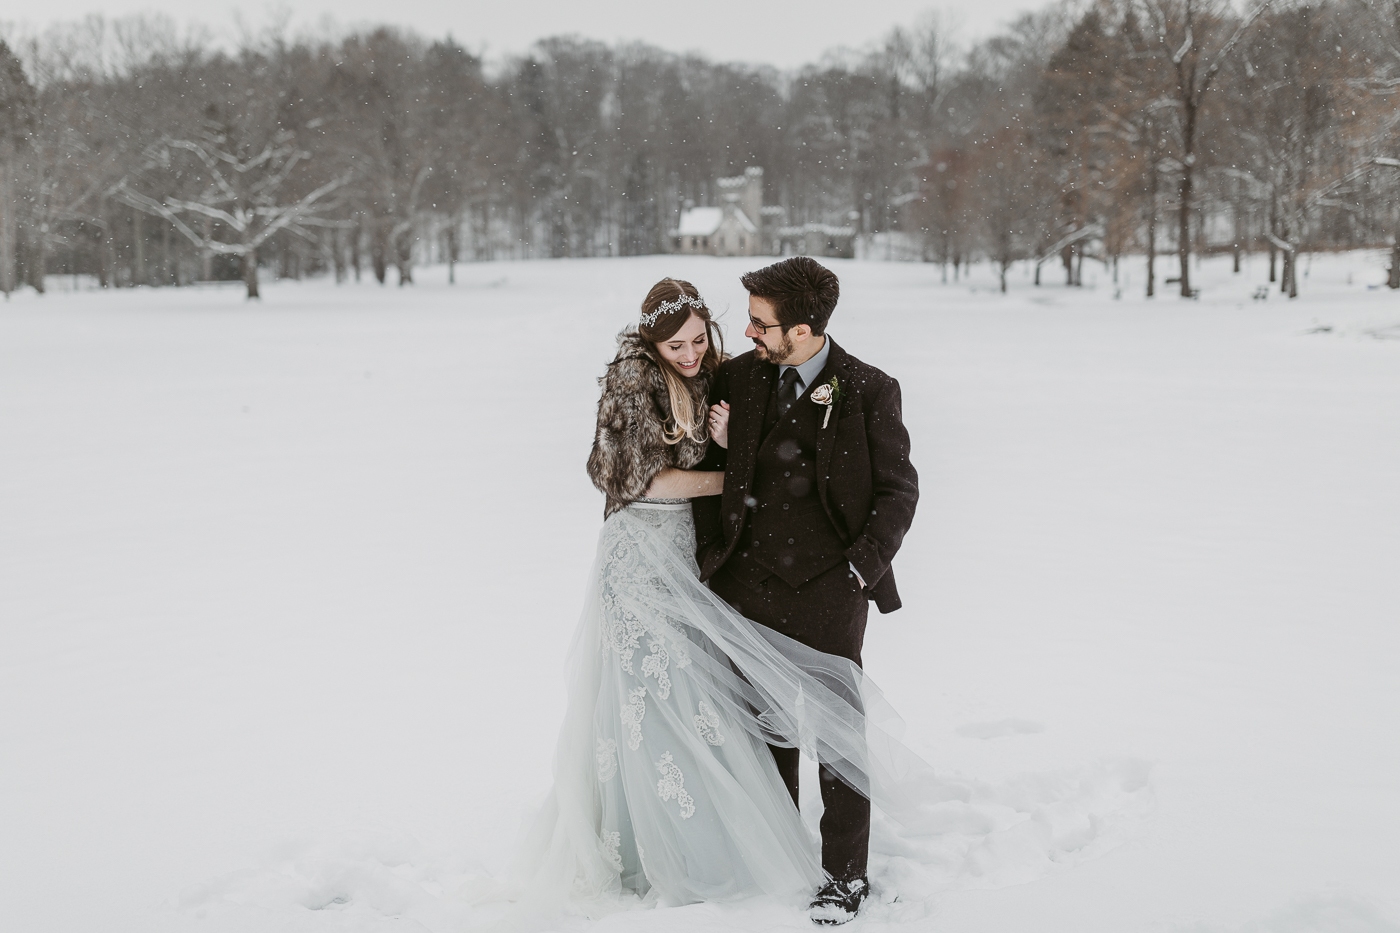 Squires-Castle-Winter-Wedding-7.jpg